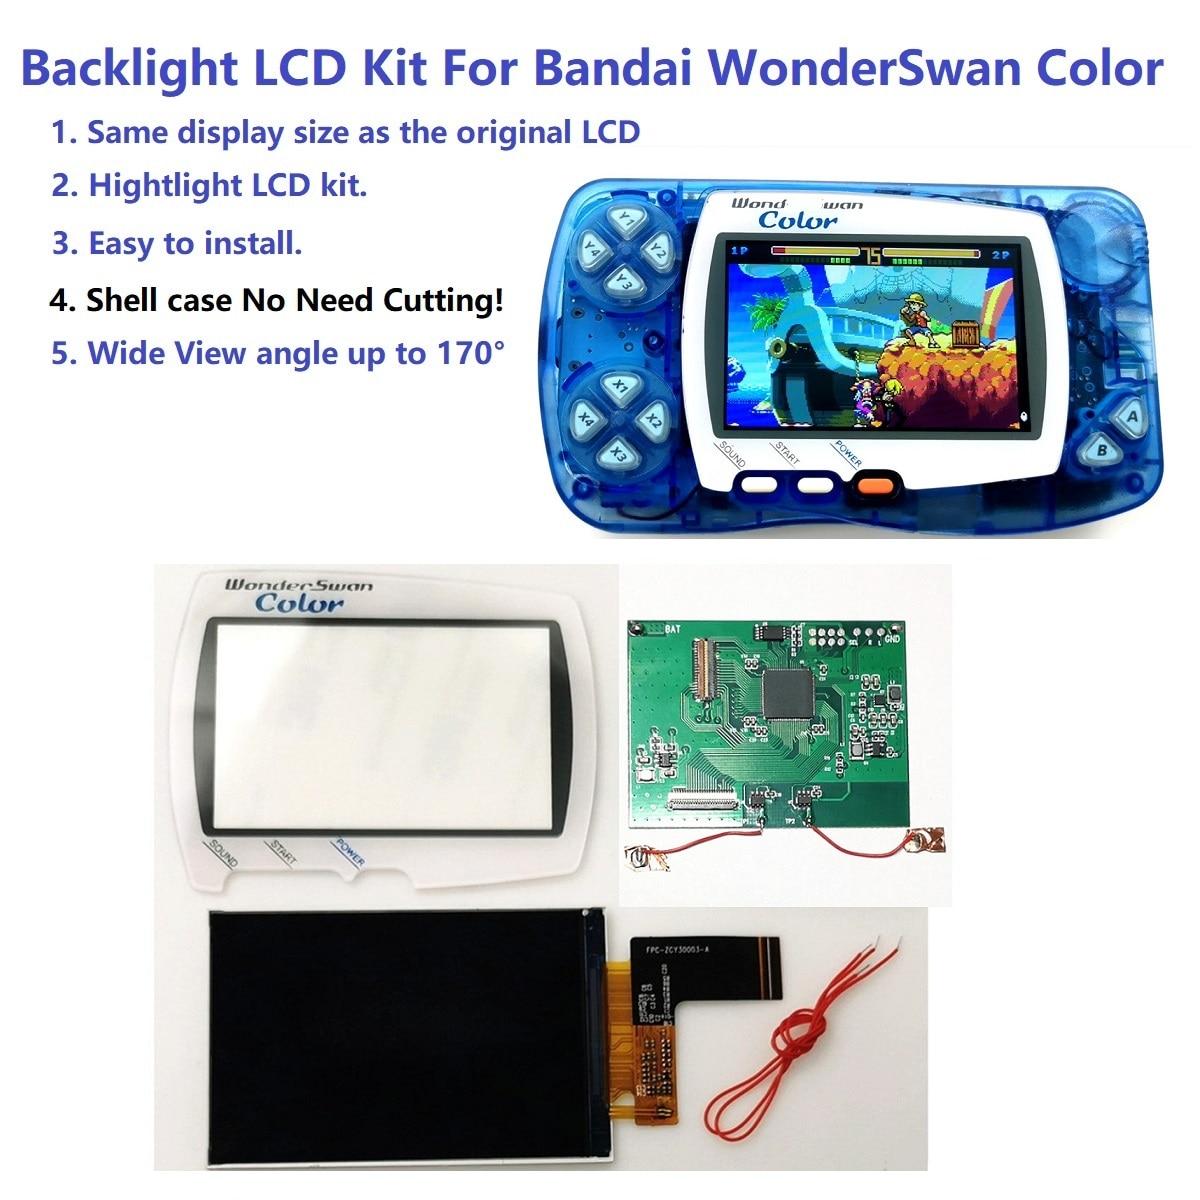 Hightlight الخلفية سطوع IPS LCD مجموعة أدوات الشاشة ل Bandai WonderSwan اللون ل WSC لعبة وحدة التحكم